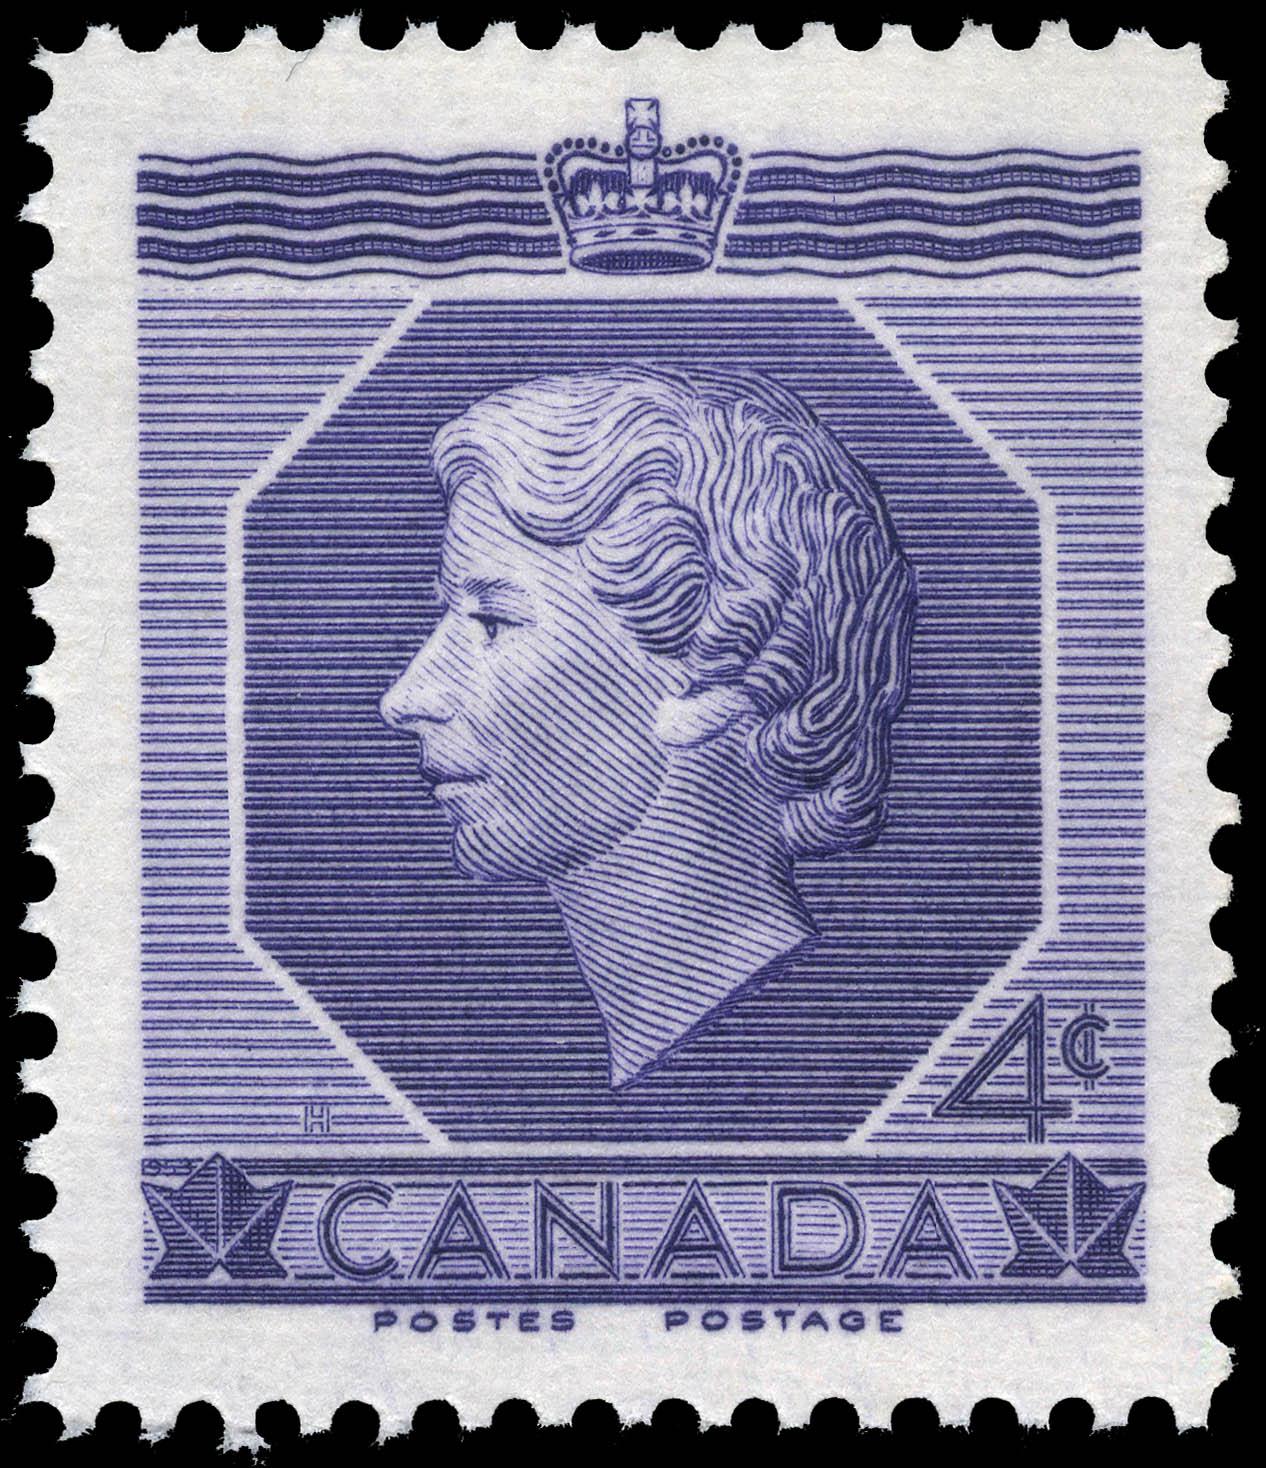 H.M. Queen Elizabeth II, Coronation Canada Postage Stamp